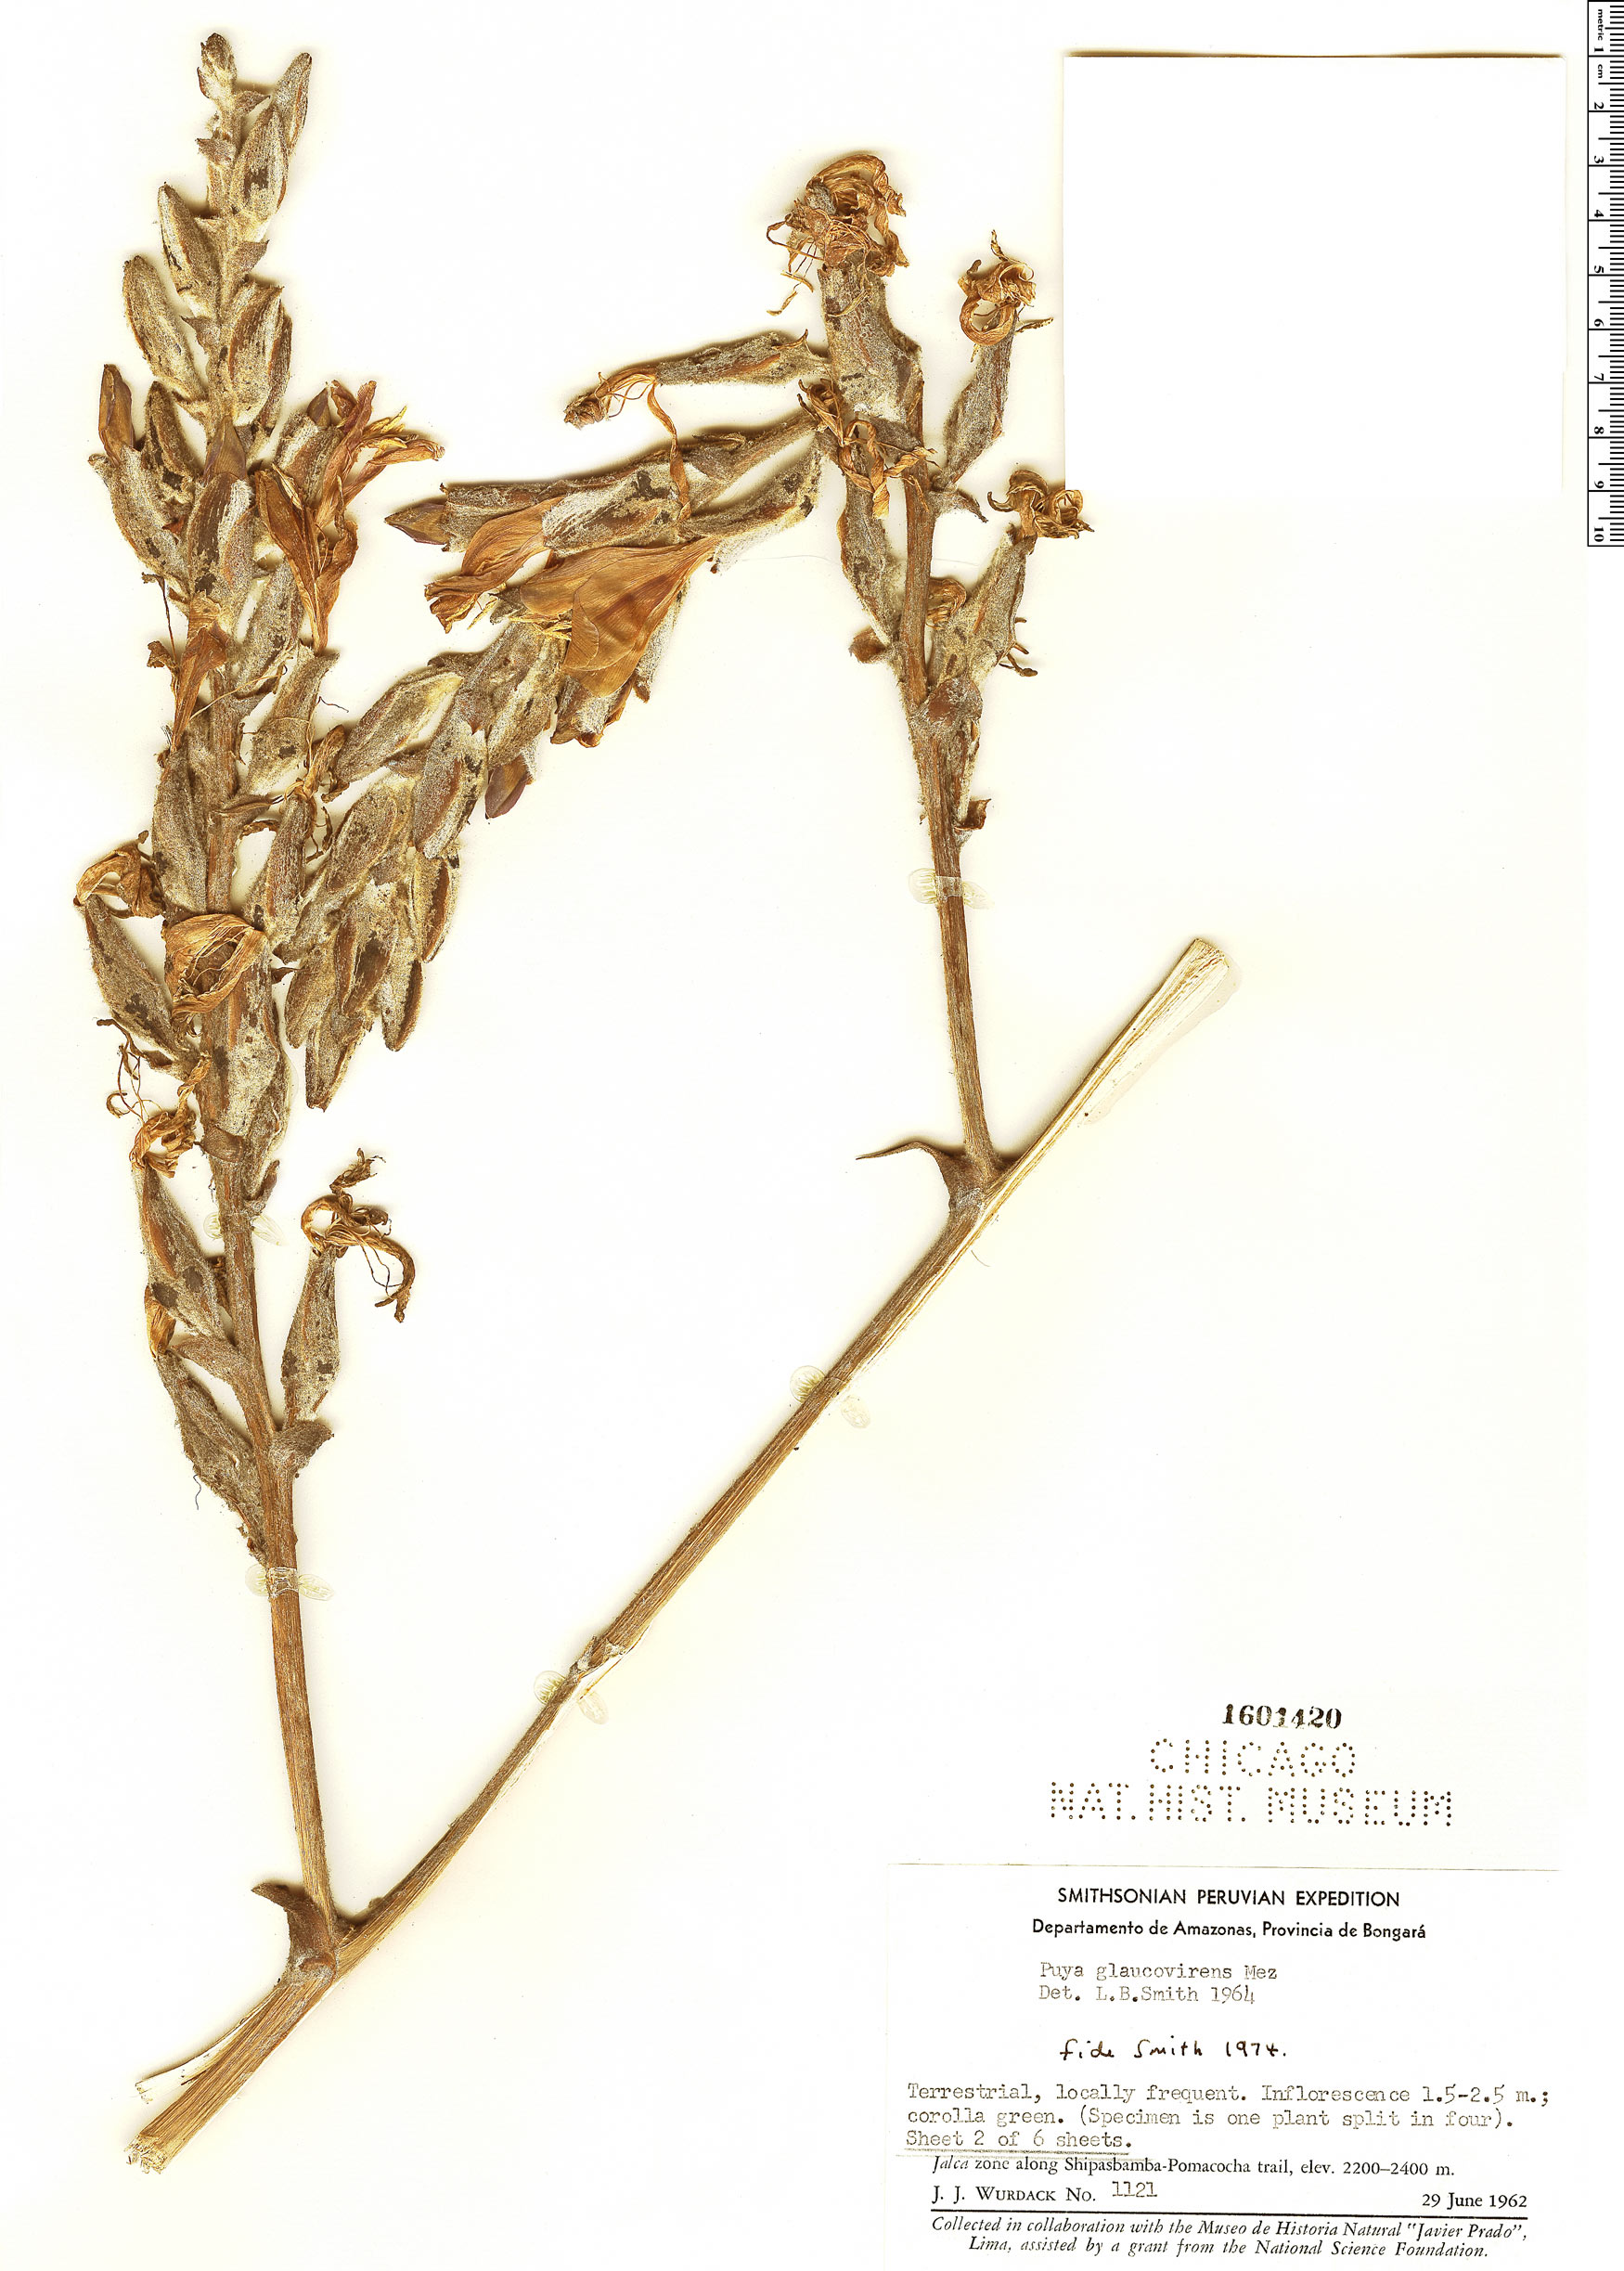 Specimen: Puya glaucovirens